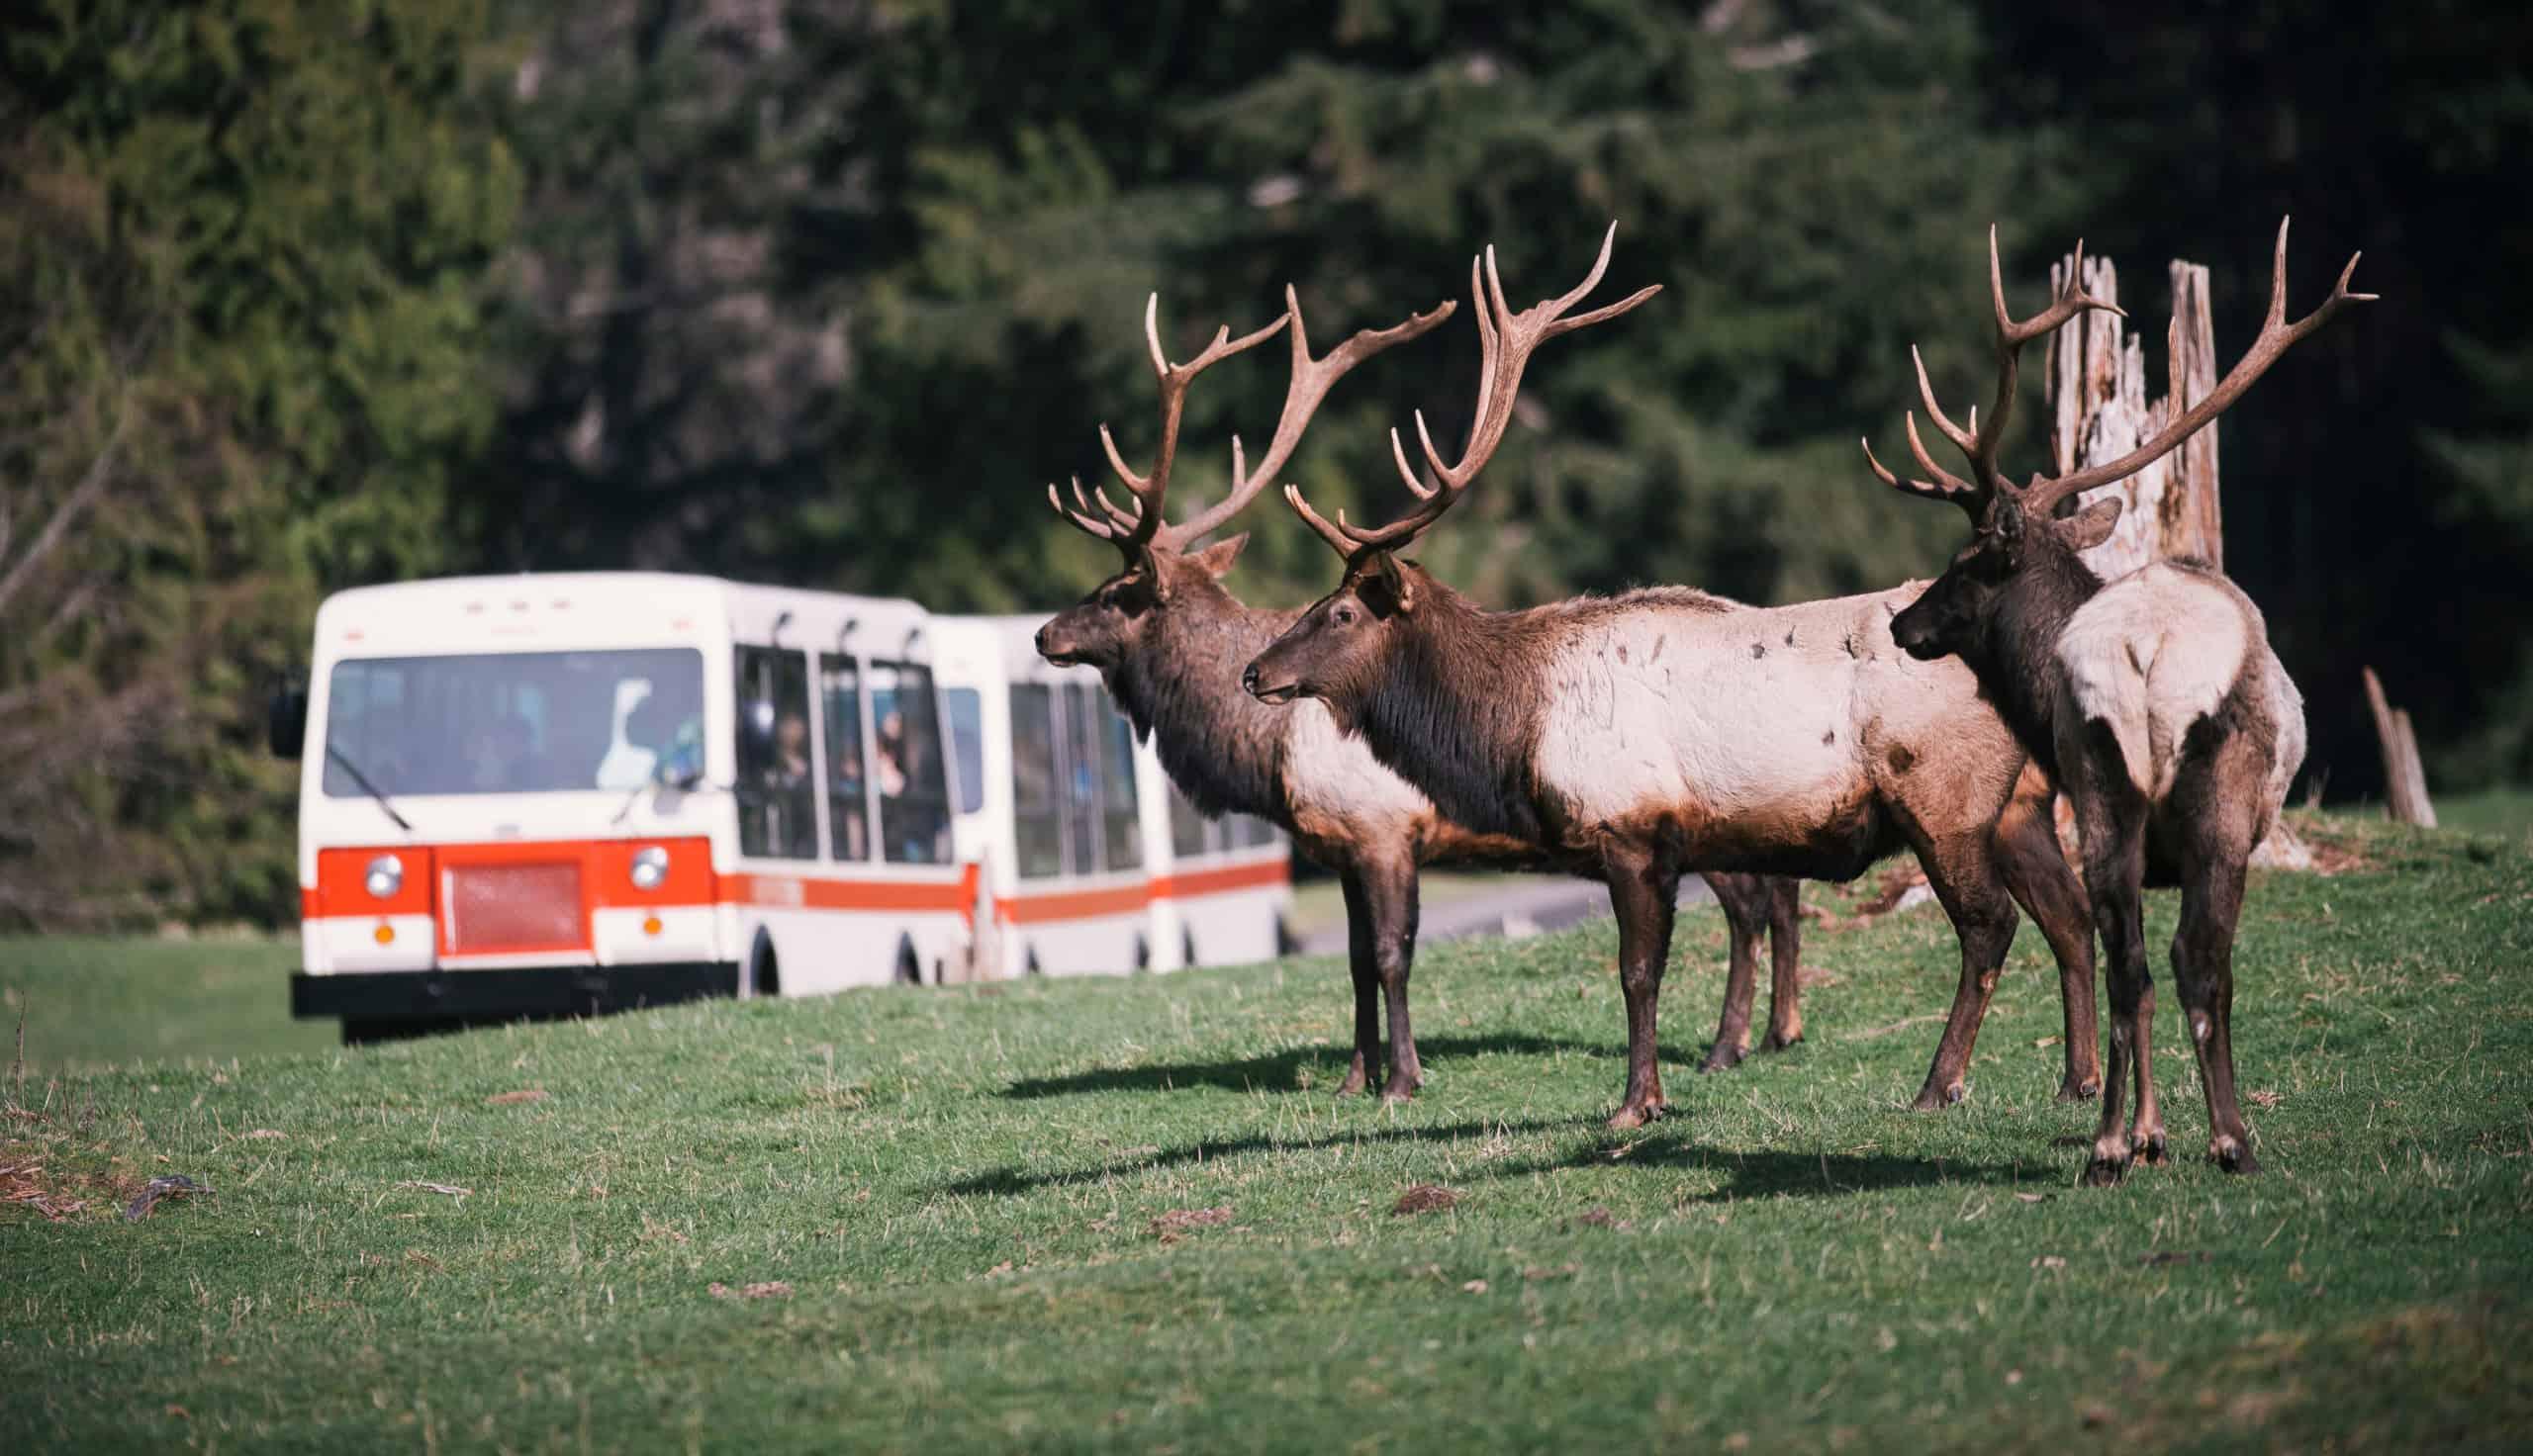 Elk herd in the foreground with a tram at Northwest Trek Wildlife Park in the background